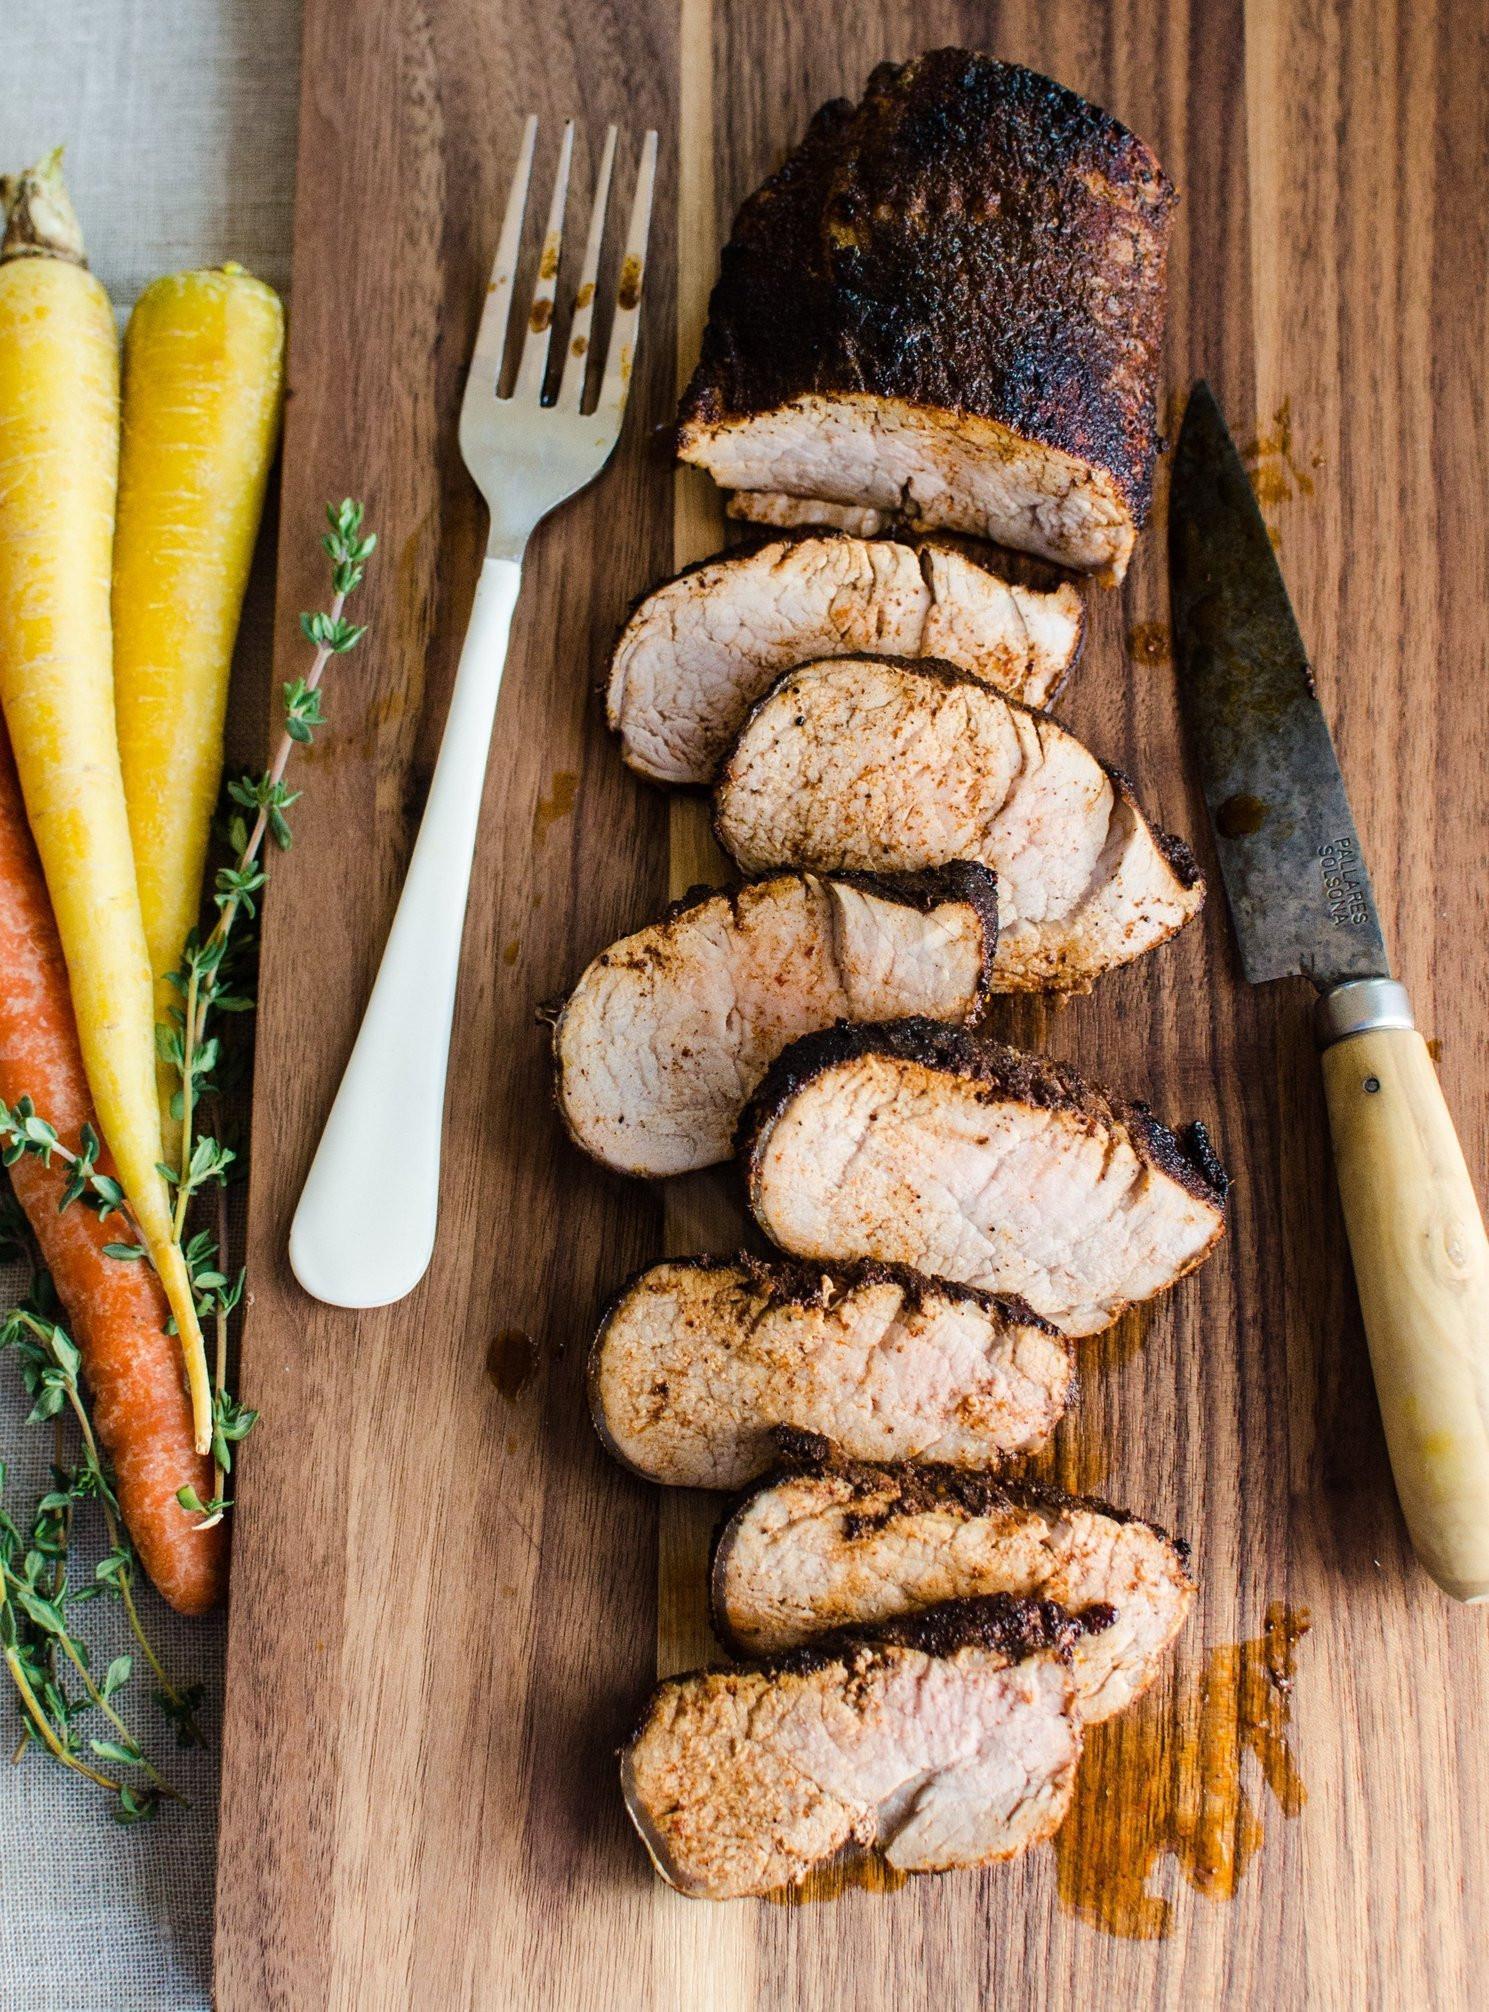 How To Cook A Pork Loin Roast  How To Make Roasted Pork Tenderloin BigOven